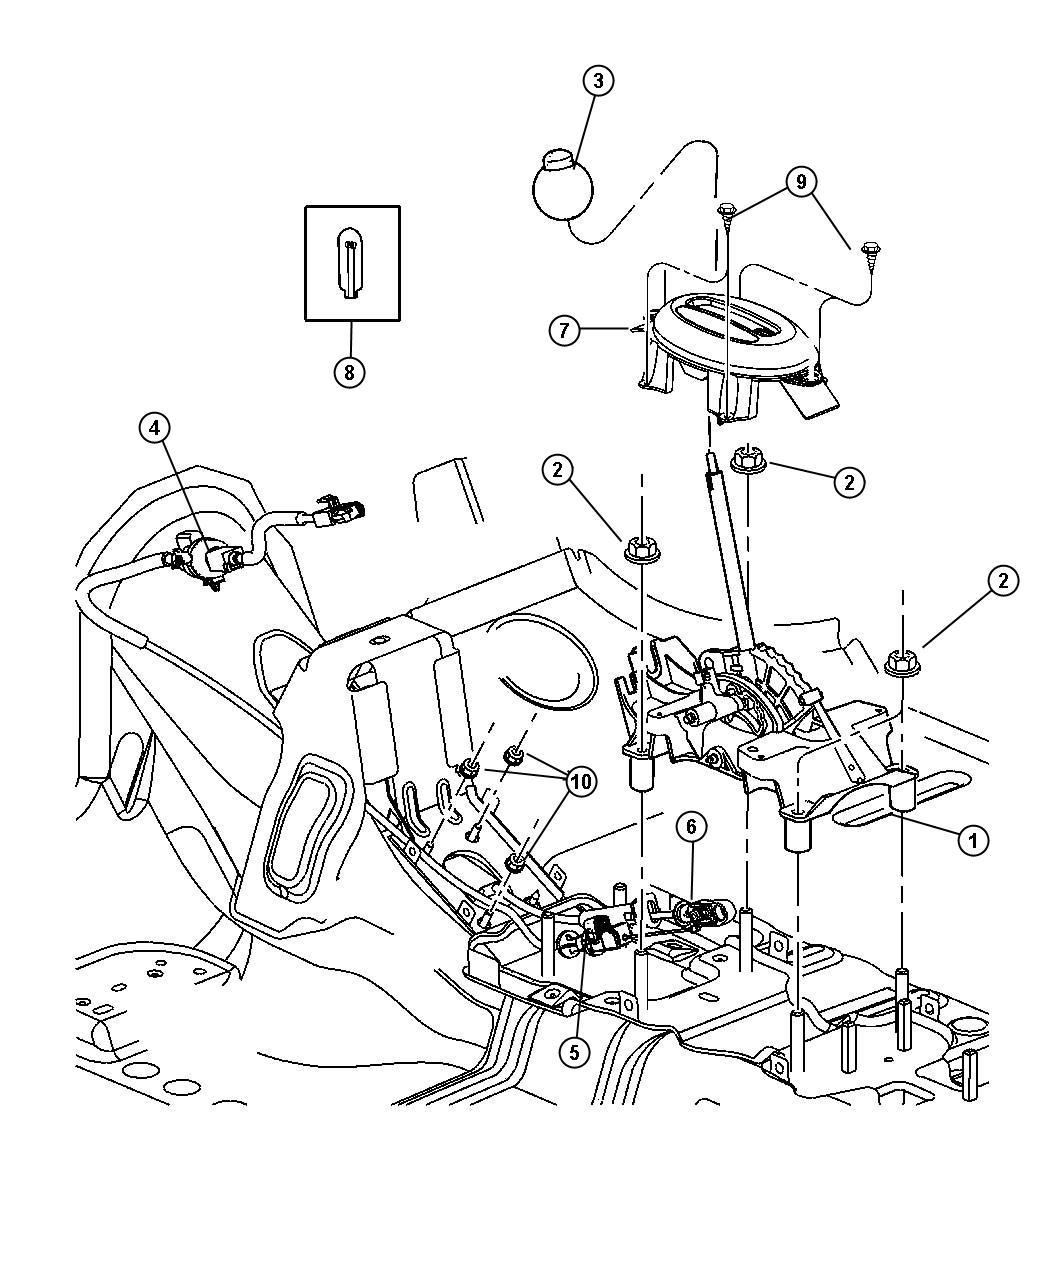 Top chrysler pacifica 2004 engine diagrams chrysler auto wiring diagram